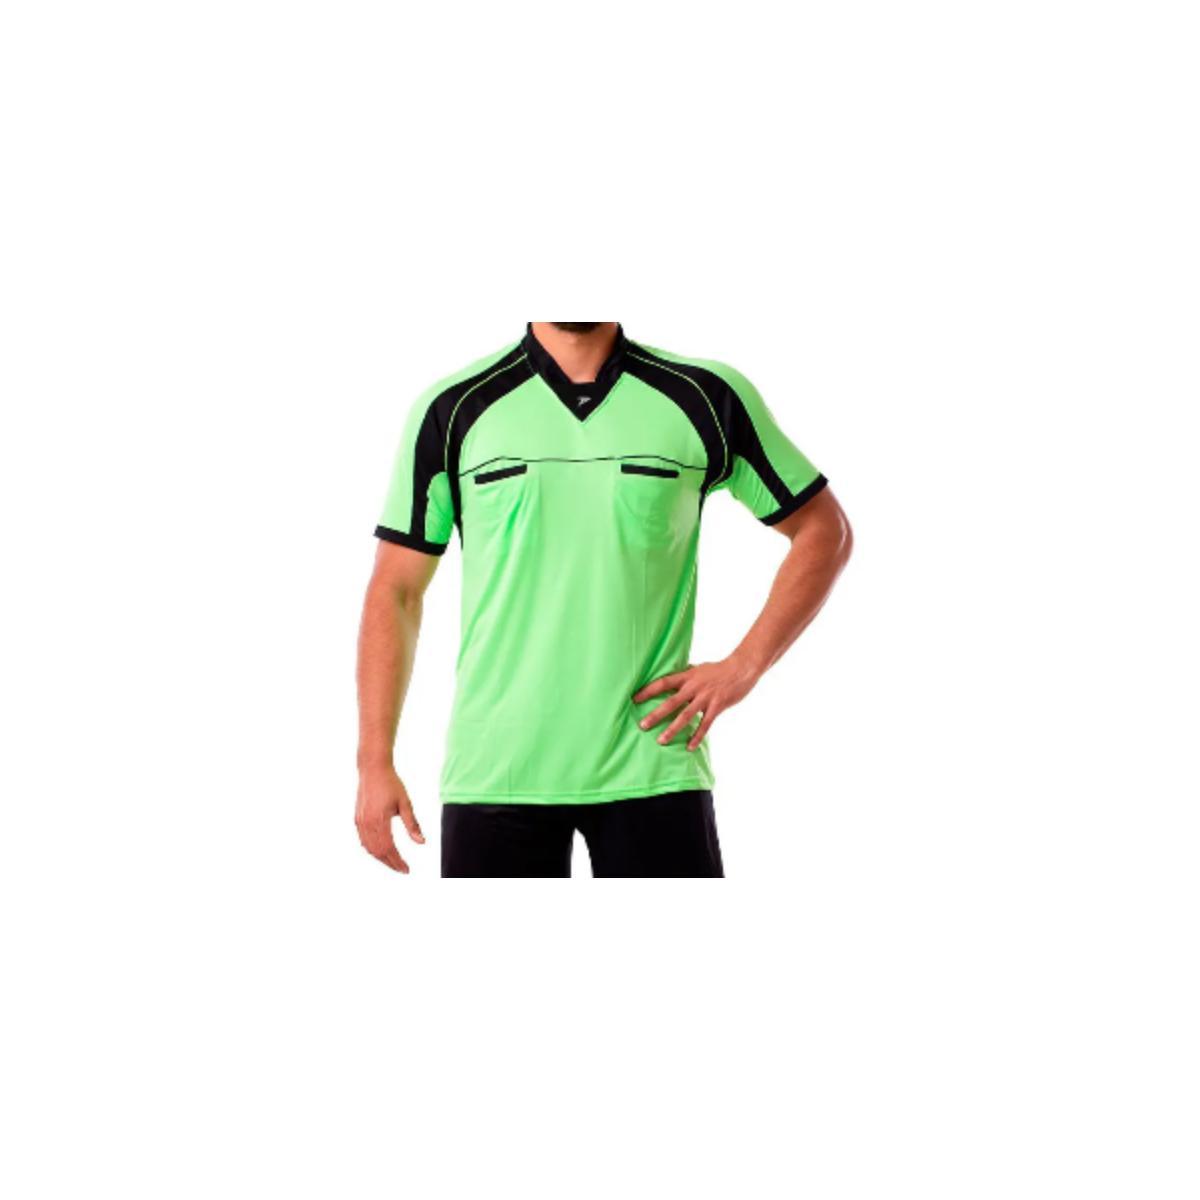 Camisa Masculina Poker 04051 Verde Neon/preto